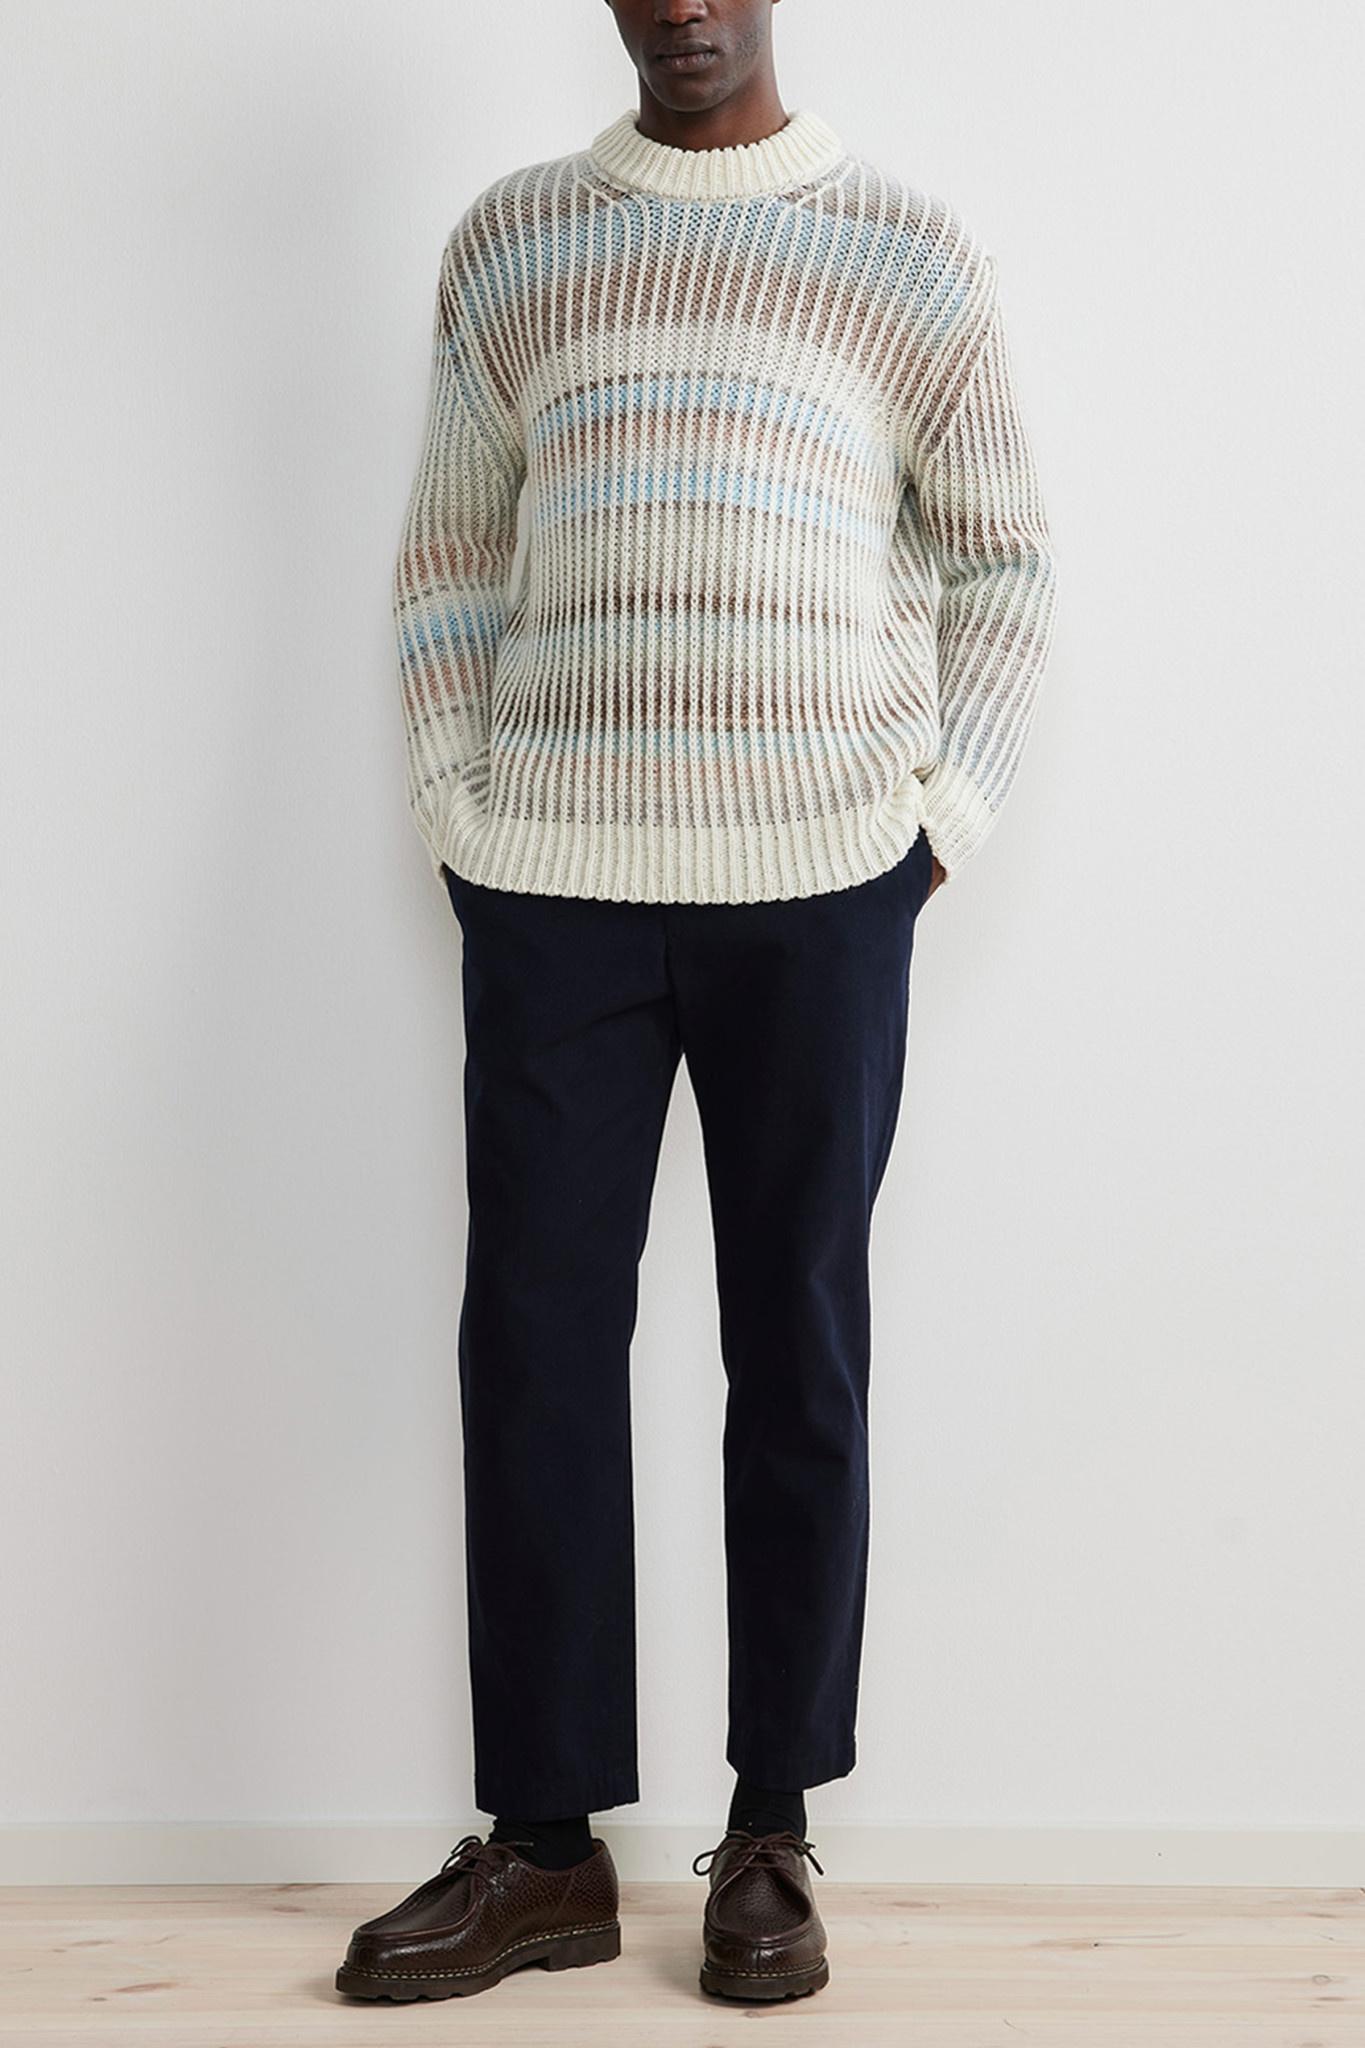 Jason Knit - Cream-1